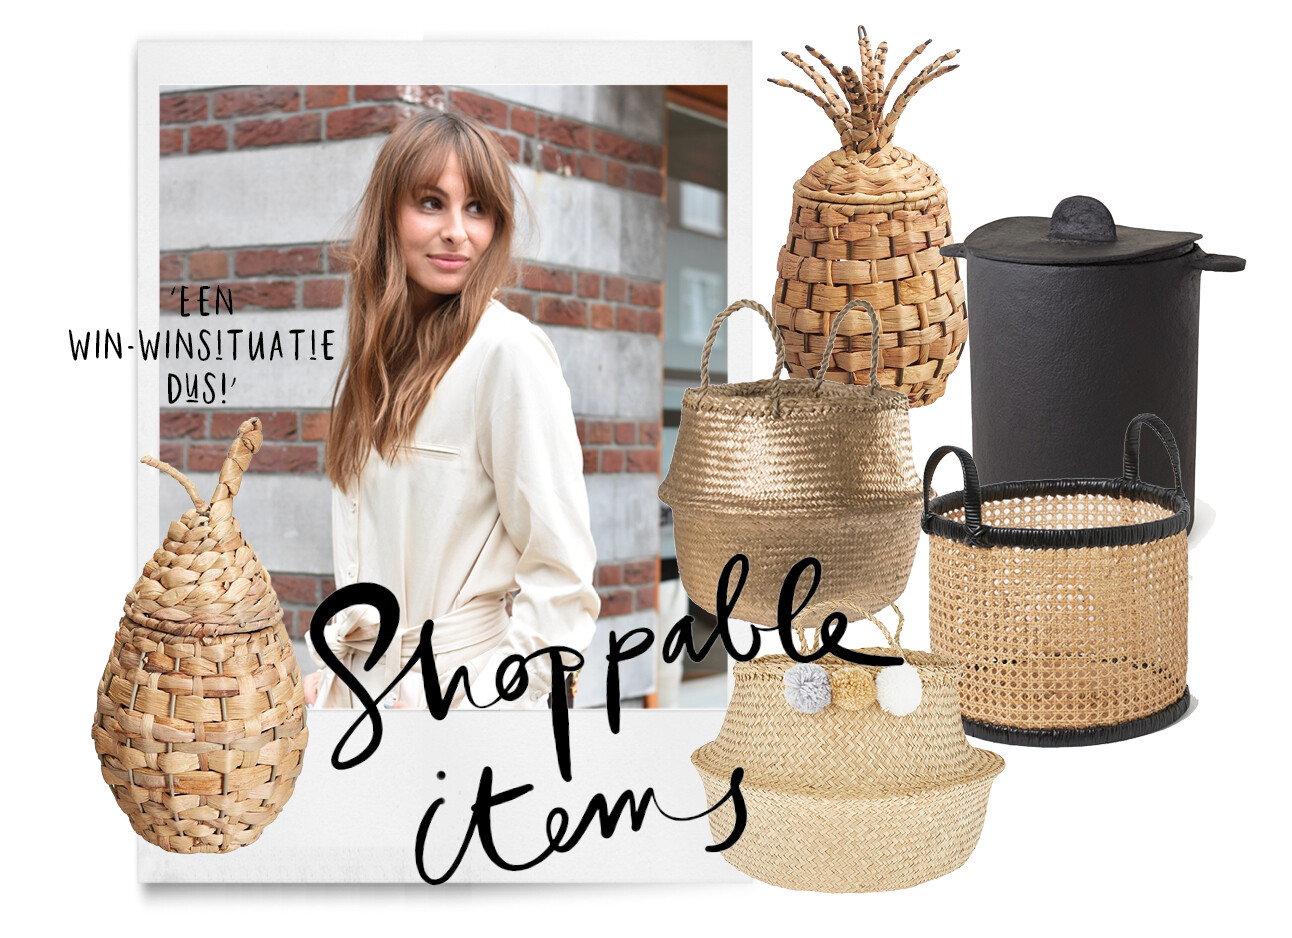 lilian shopping items manden